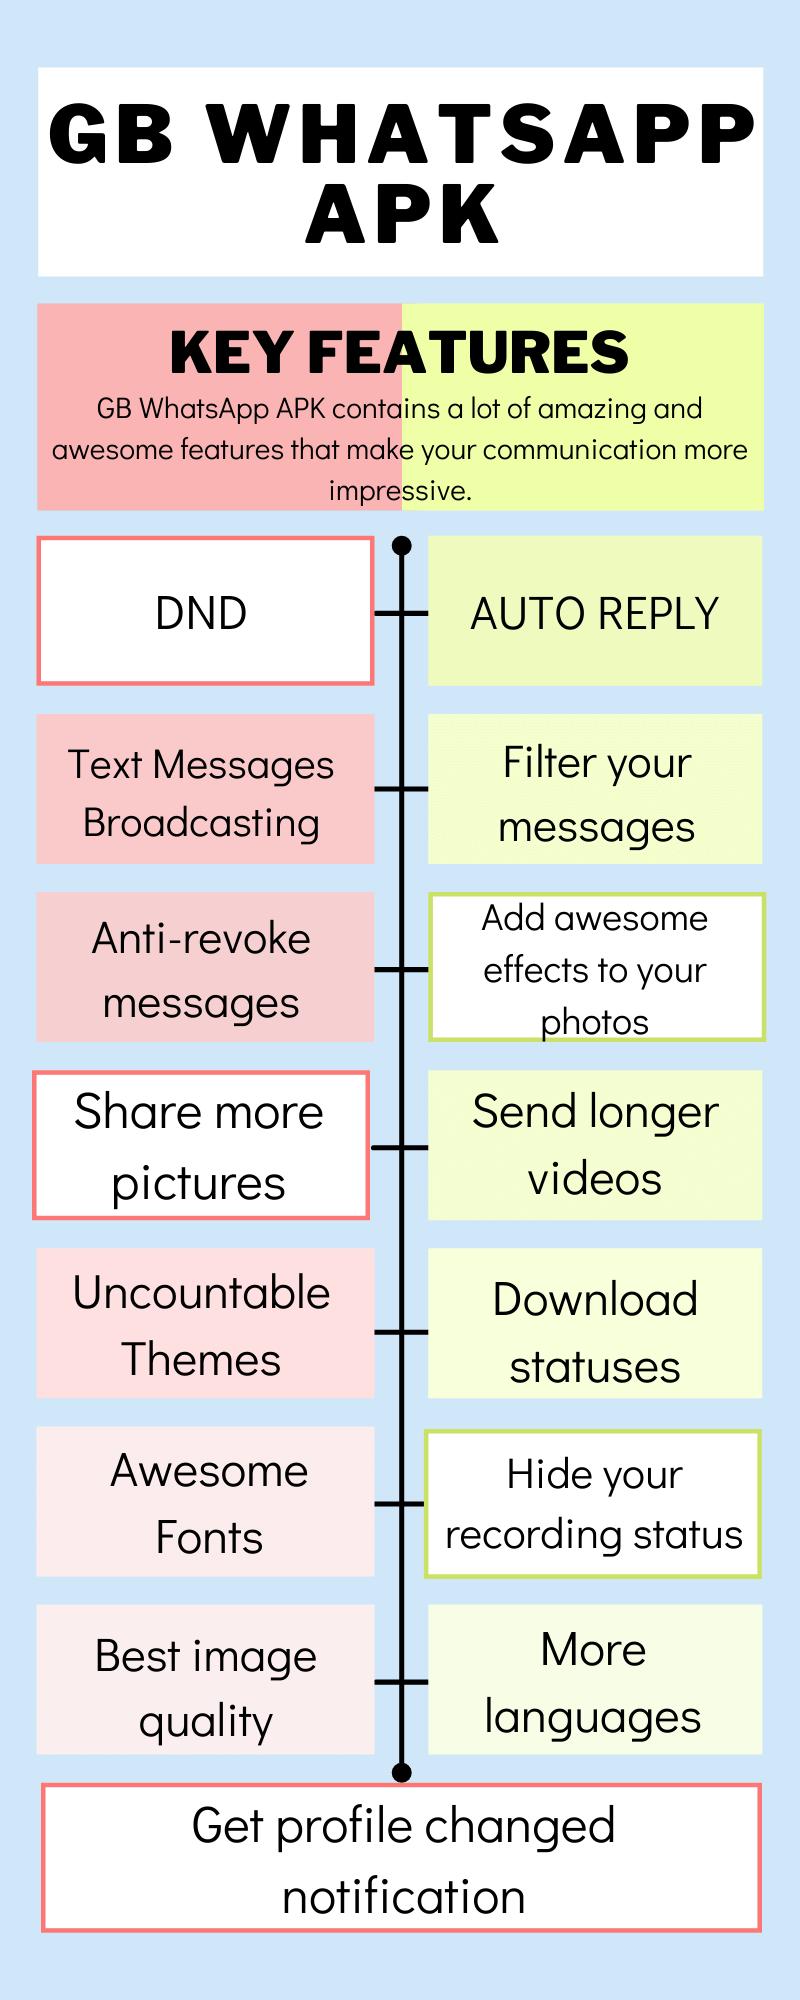 GB WhatsApp APK Features